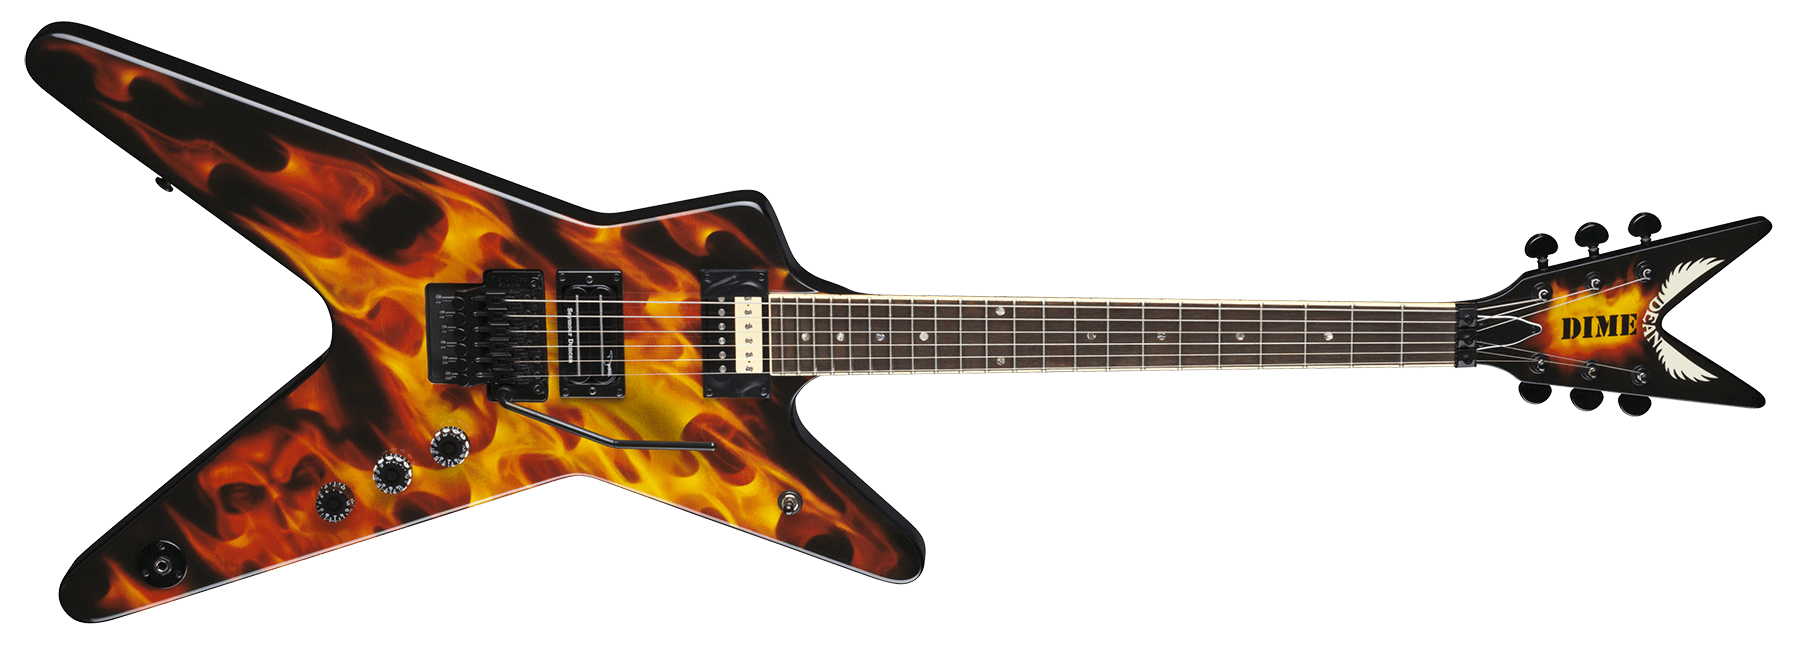 Black Dot Wallpaper Dimebag Dime O Flame Ml Dean Guitars